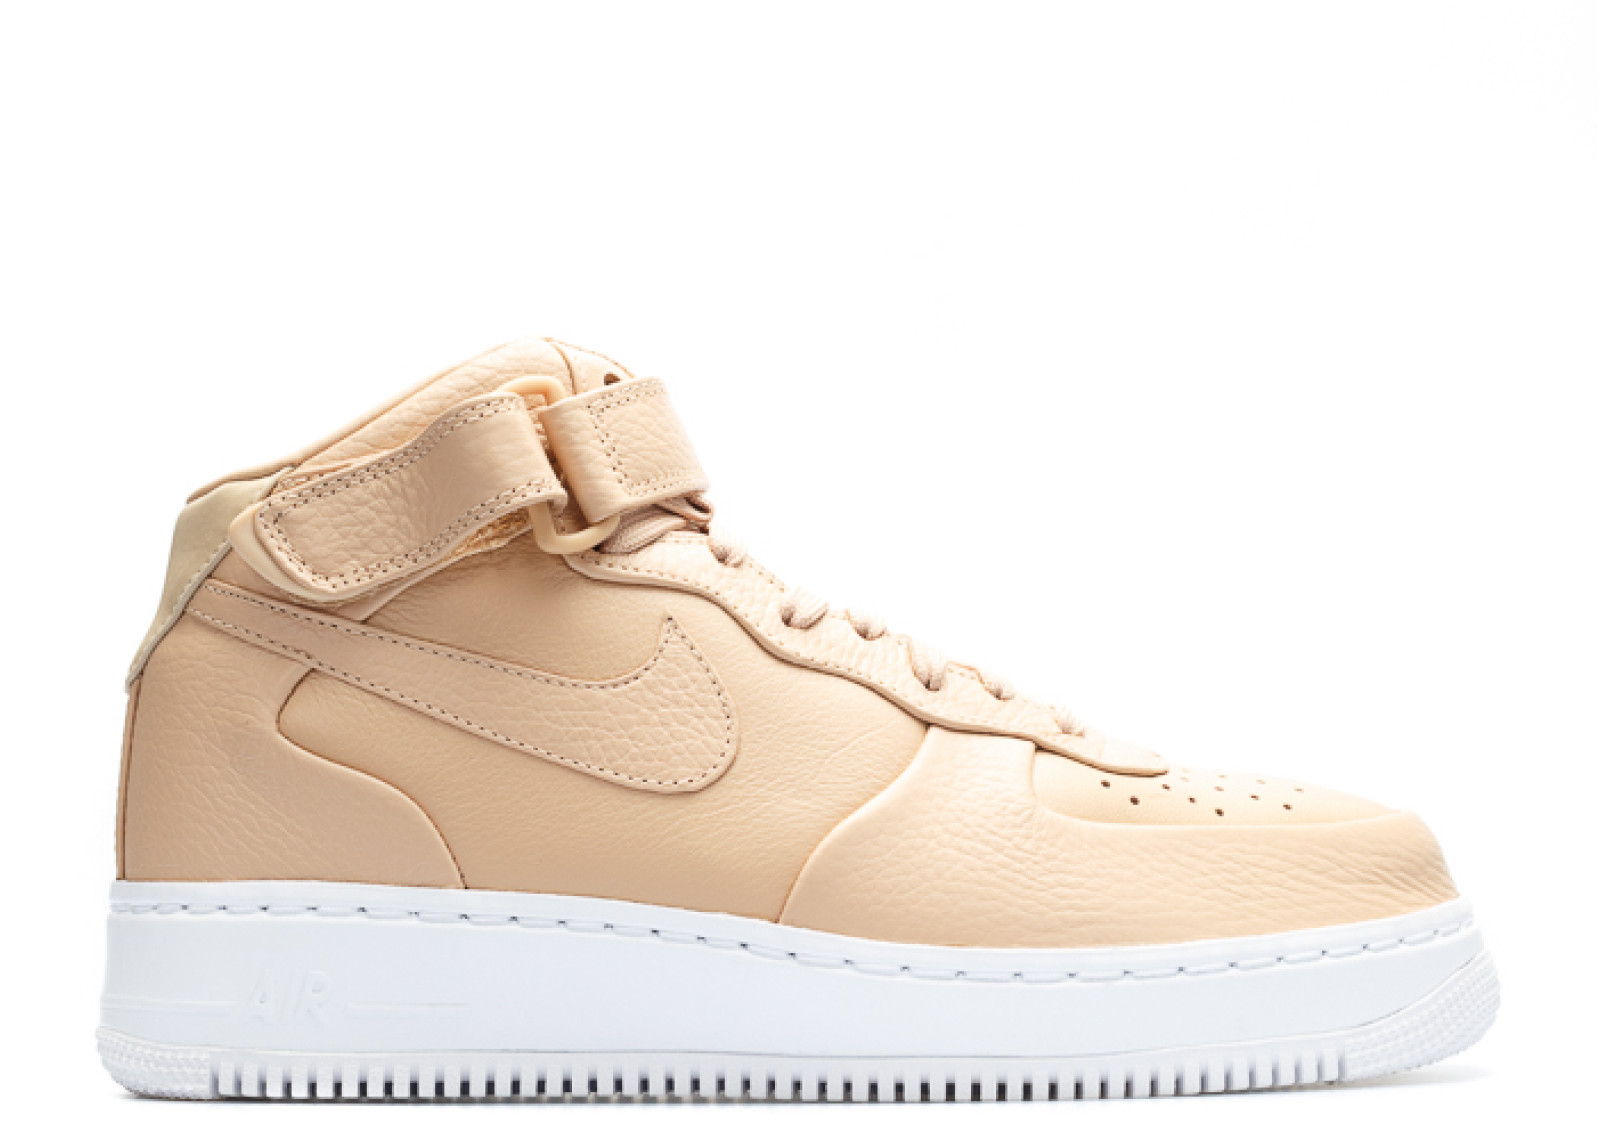 100% authentic 85dd2 b0f1a shoes, nike, beige, nike air, white, nude, nail polish, nike air force 1, nike  af1s, nude sneakers, tennis shoes, airforce 1, nike shoes, a1, sand, air ...